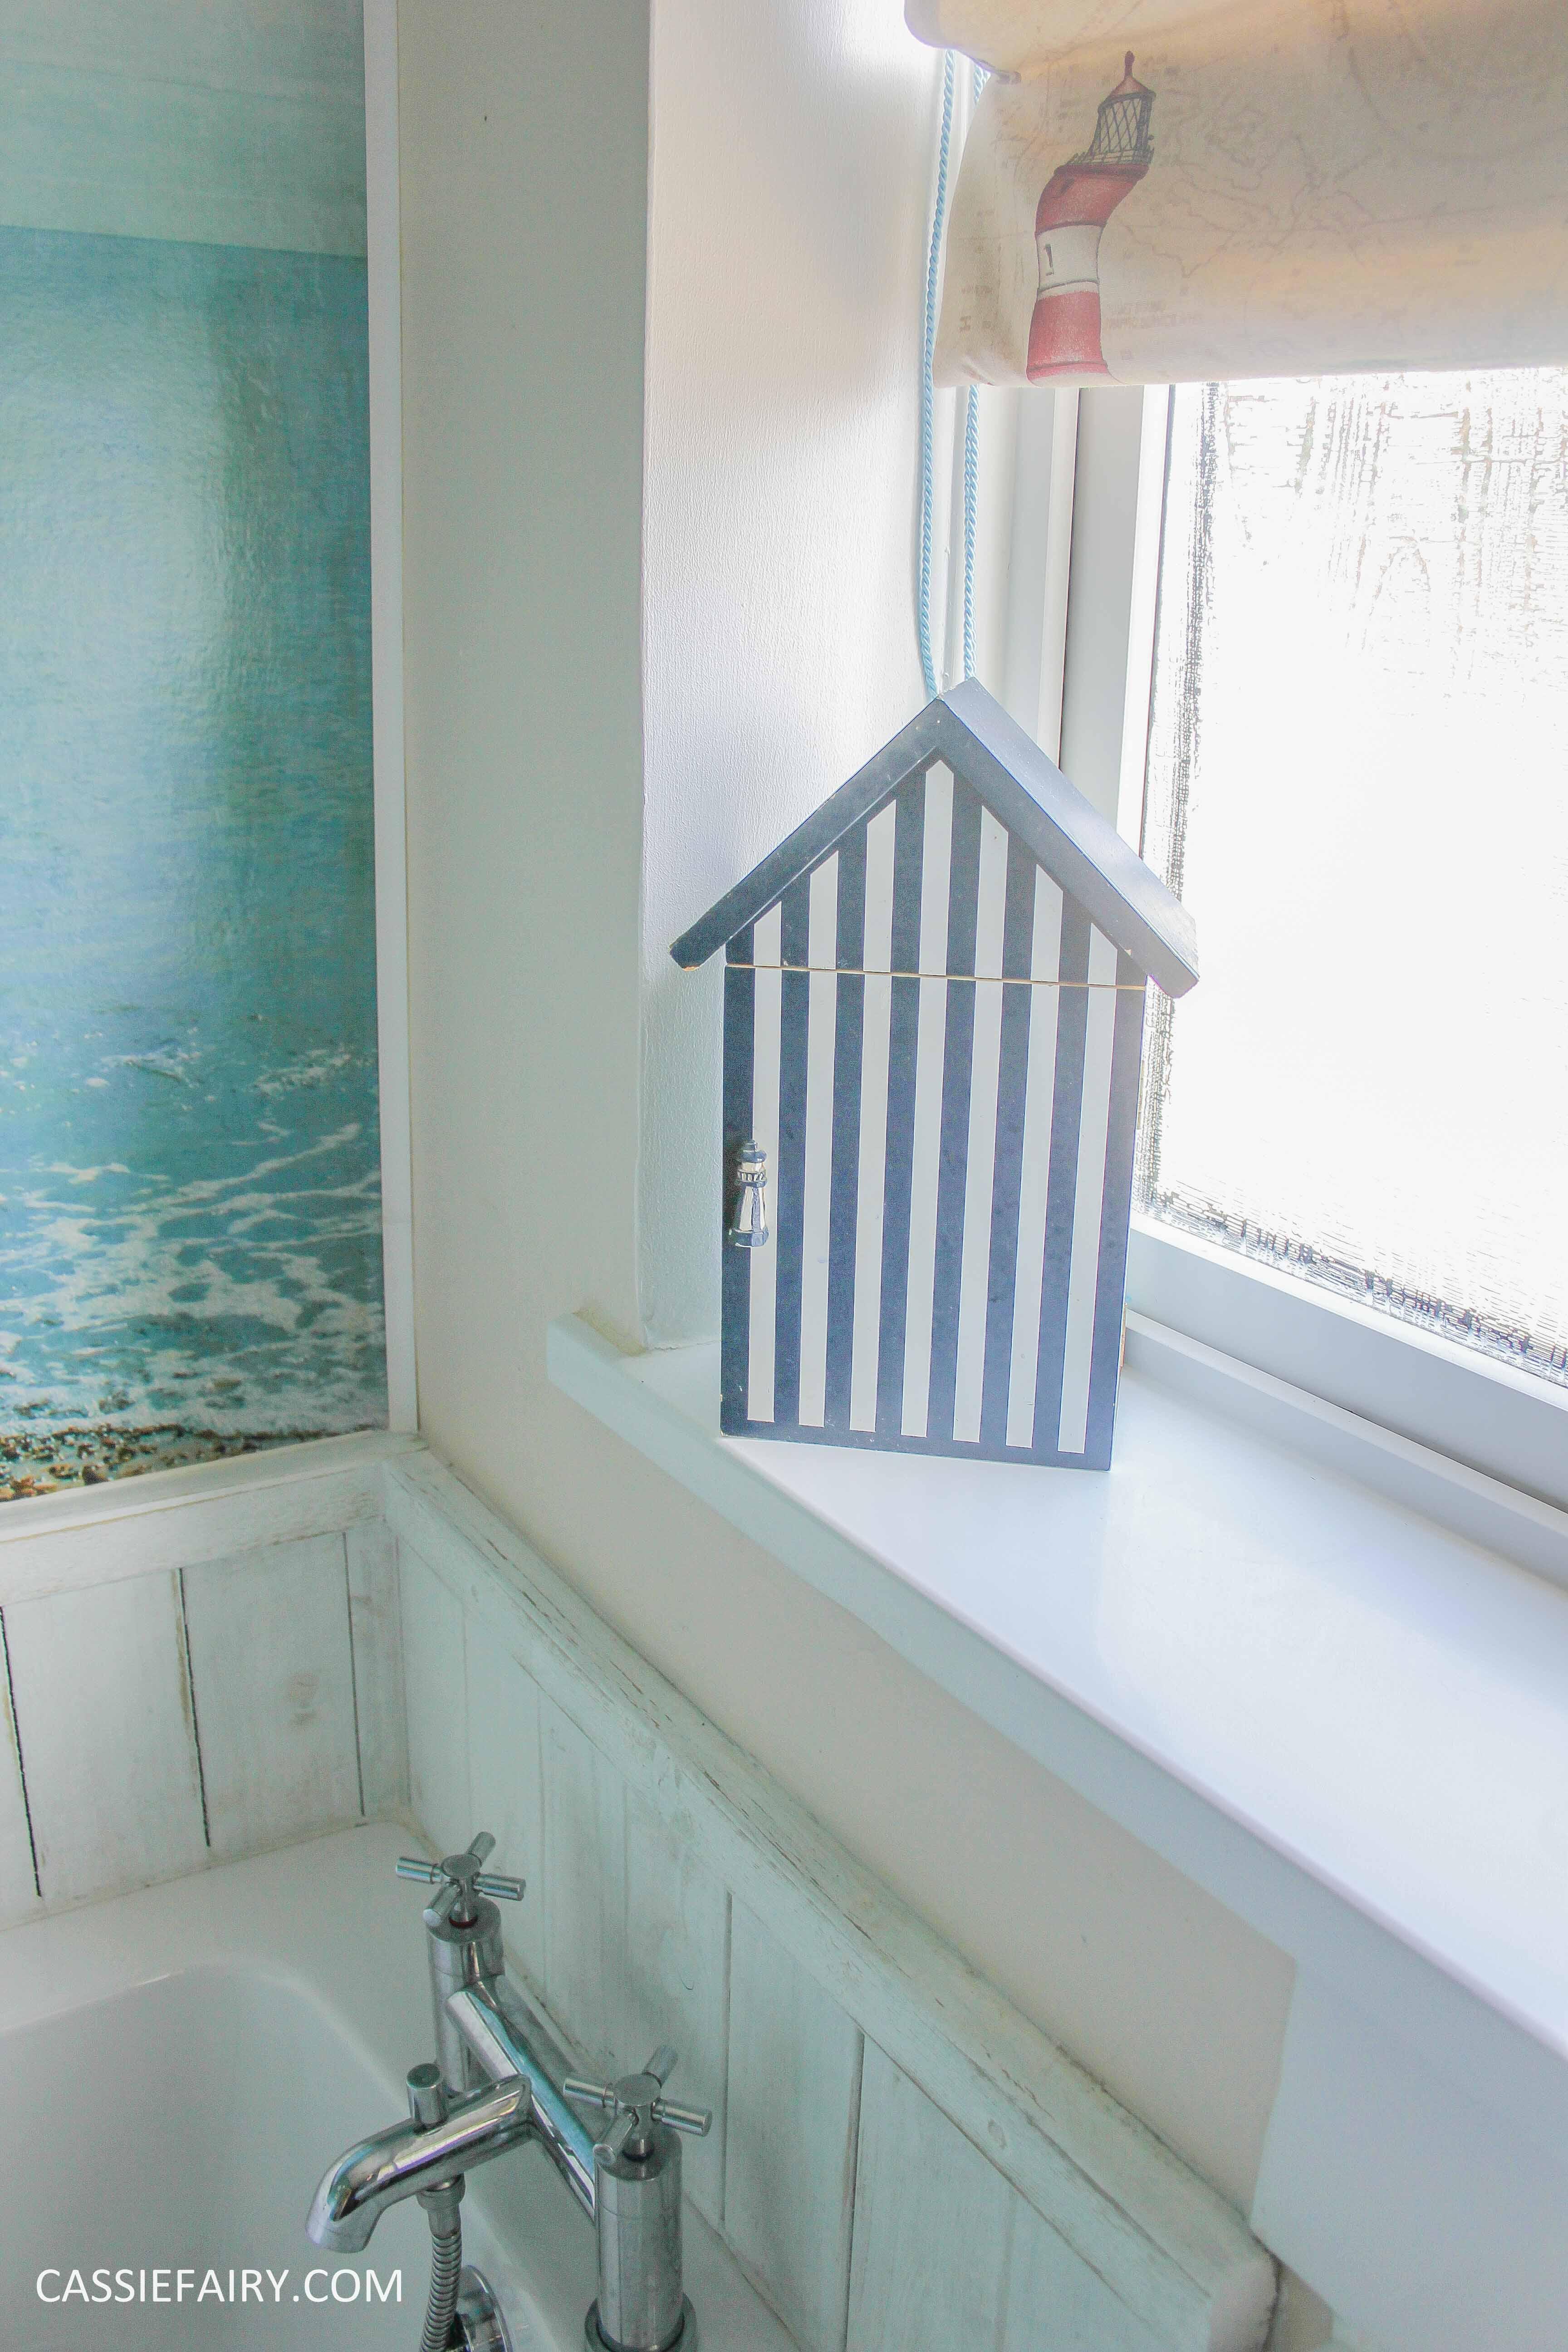 diy beach hut bathroom makeover project - low budget renovation-3